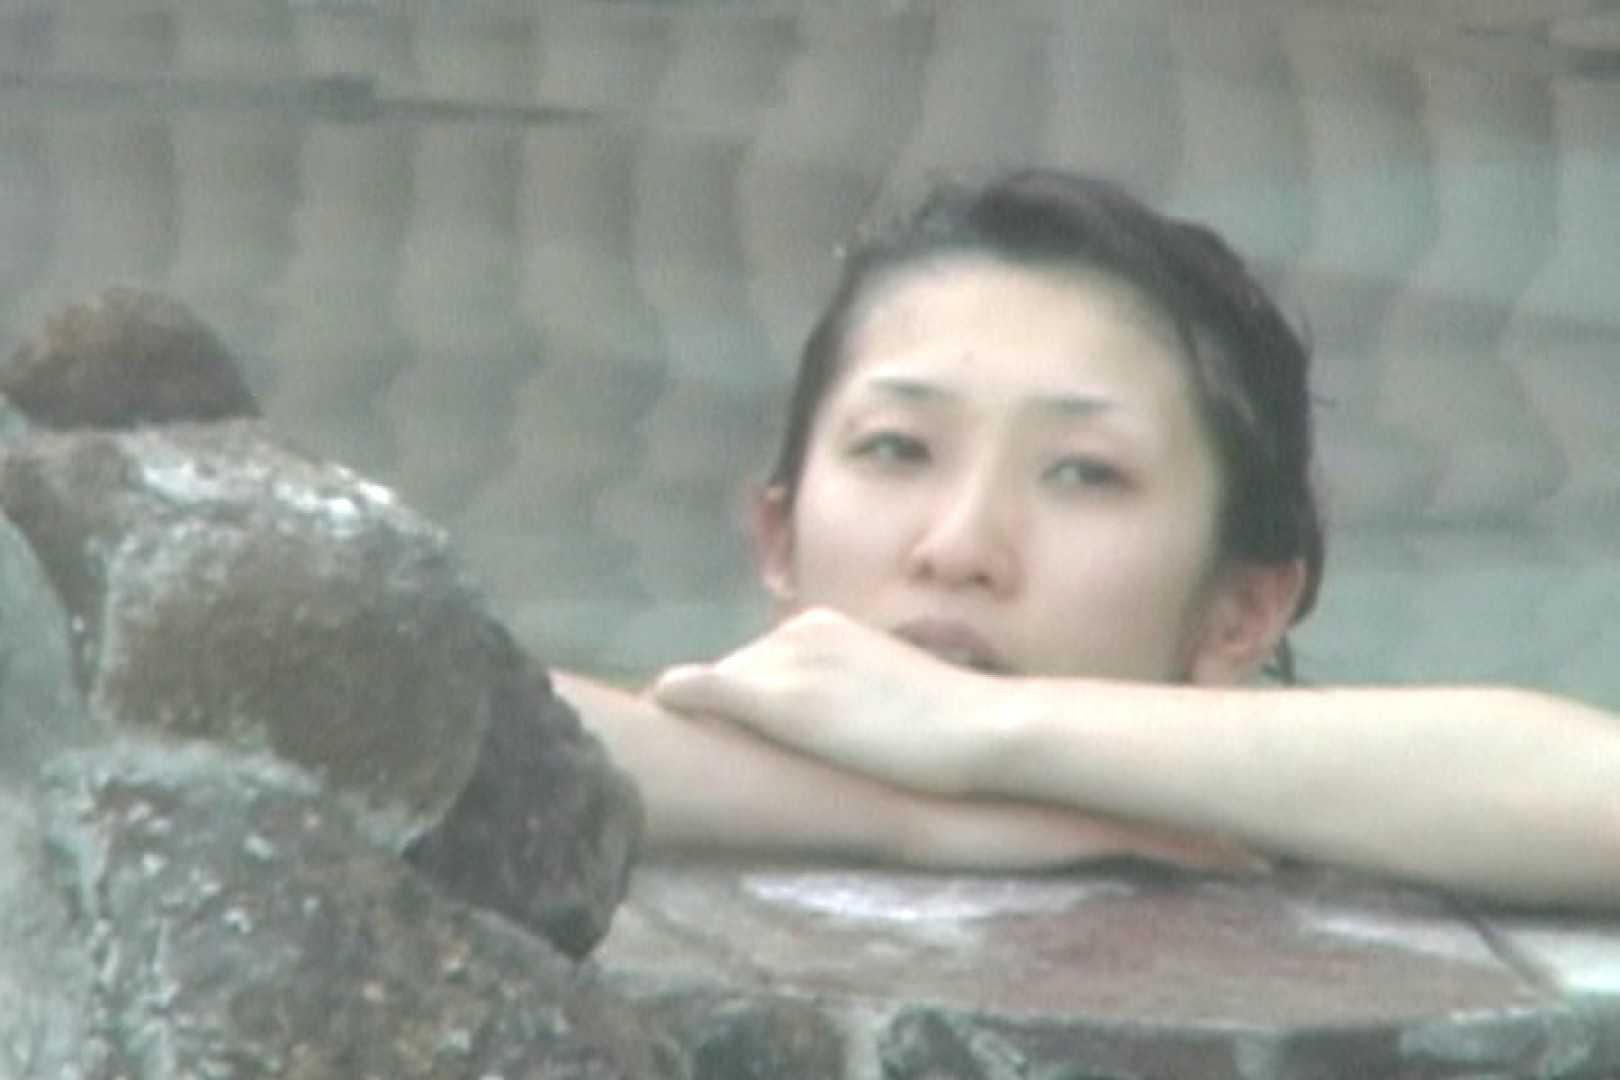 Aquaな露天風呂Vol.588 HなOL | 盗撮  66pic 17